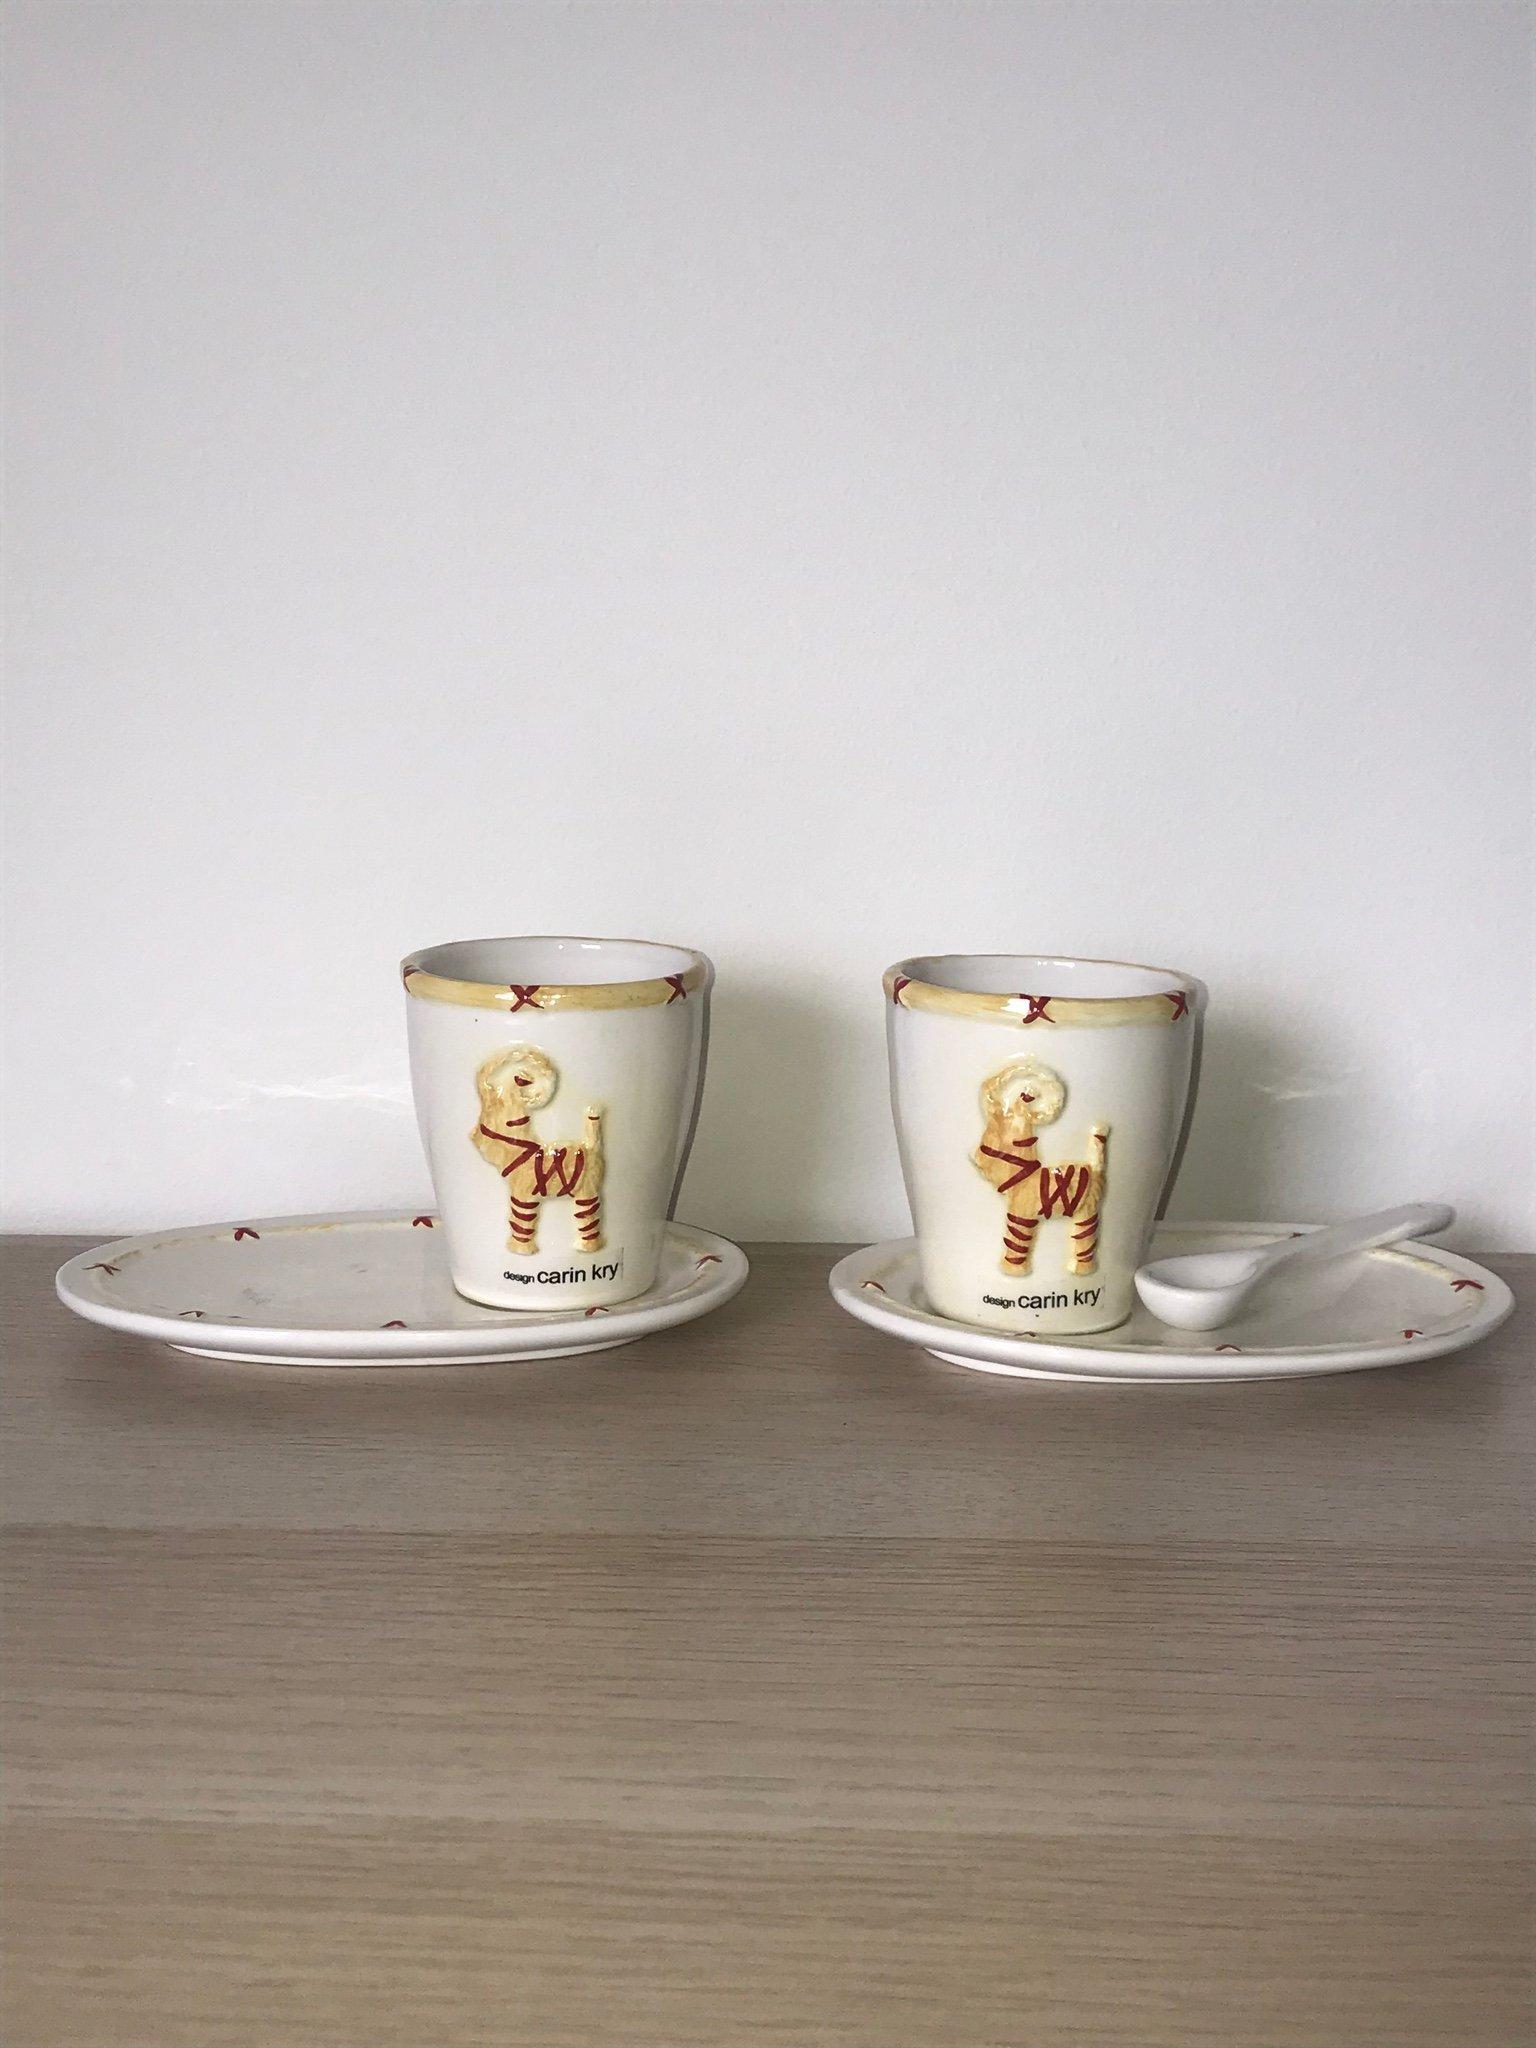 carin kry kaffekoppar